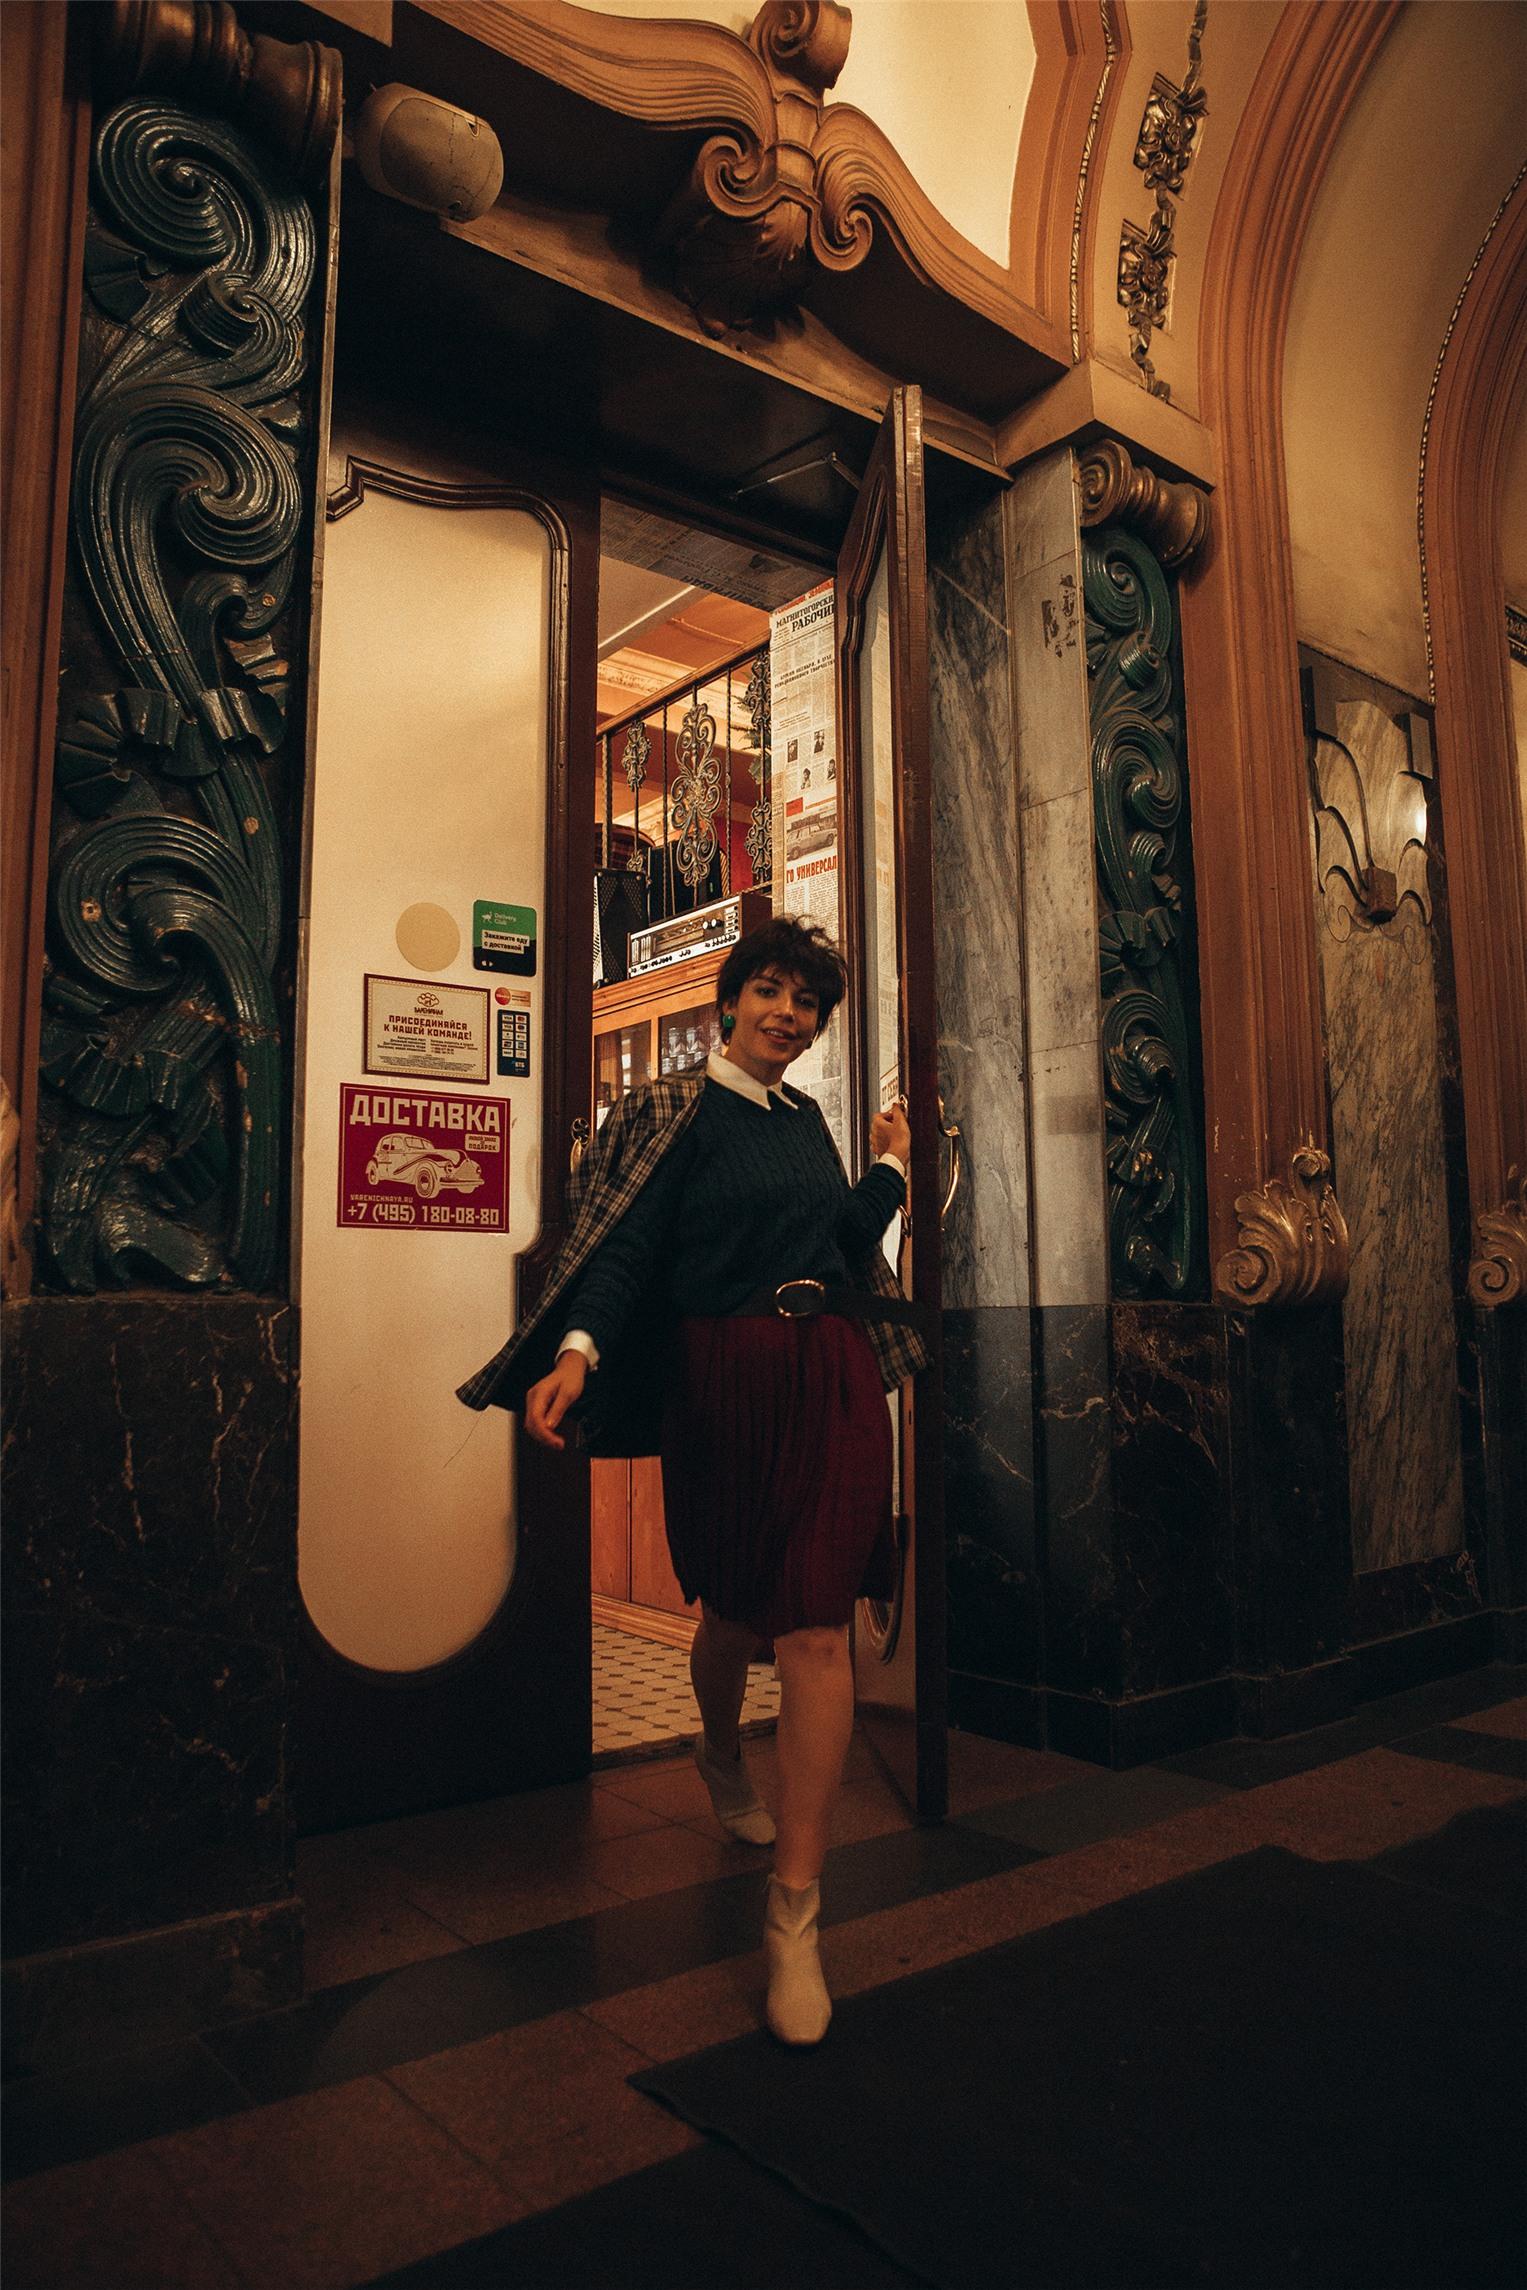 СССР 80-х годов / Хильда Кармен, фотограф Екатерина Гажура